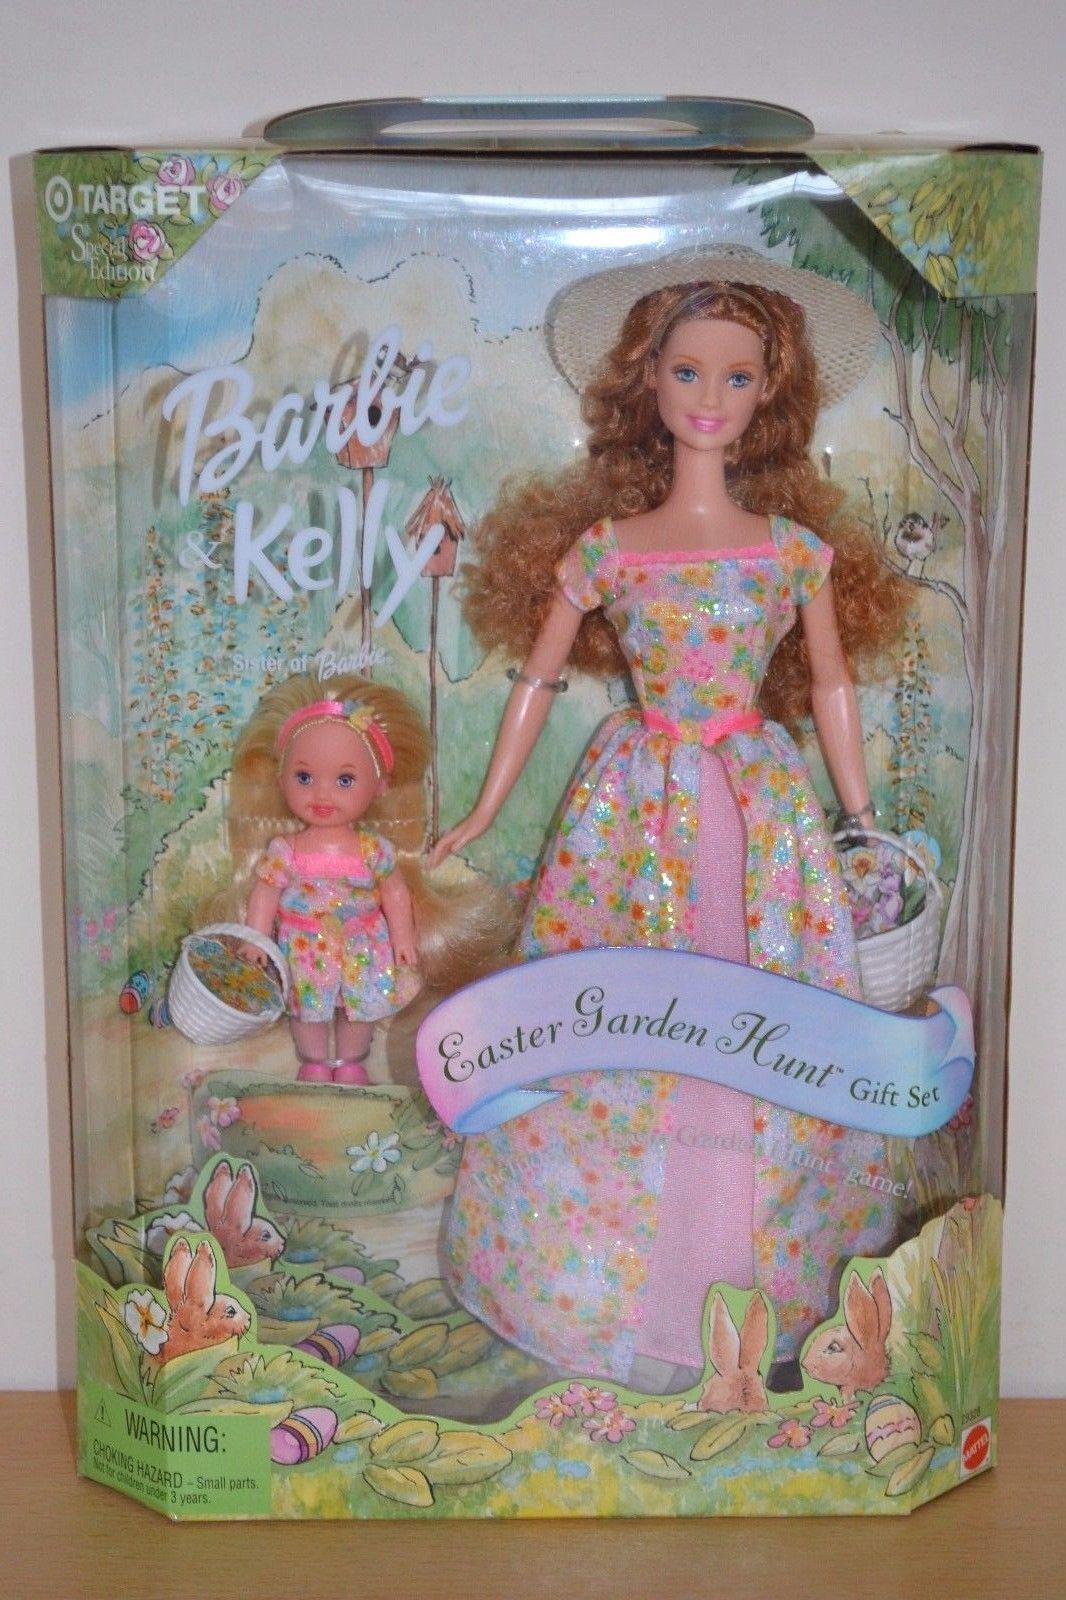 Barbie and Kelly Easter Garden Hunt 2000 Doll for sale online